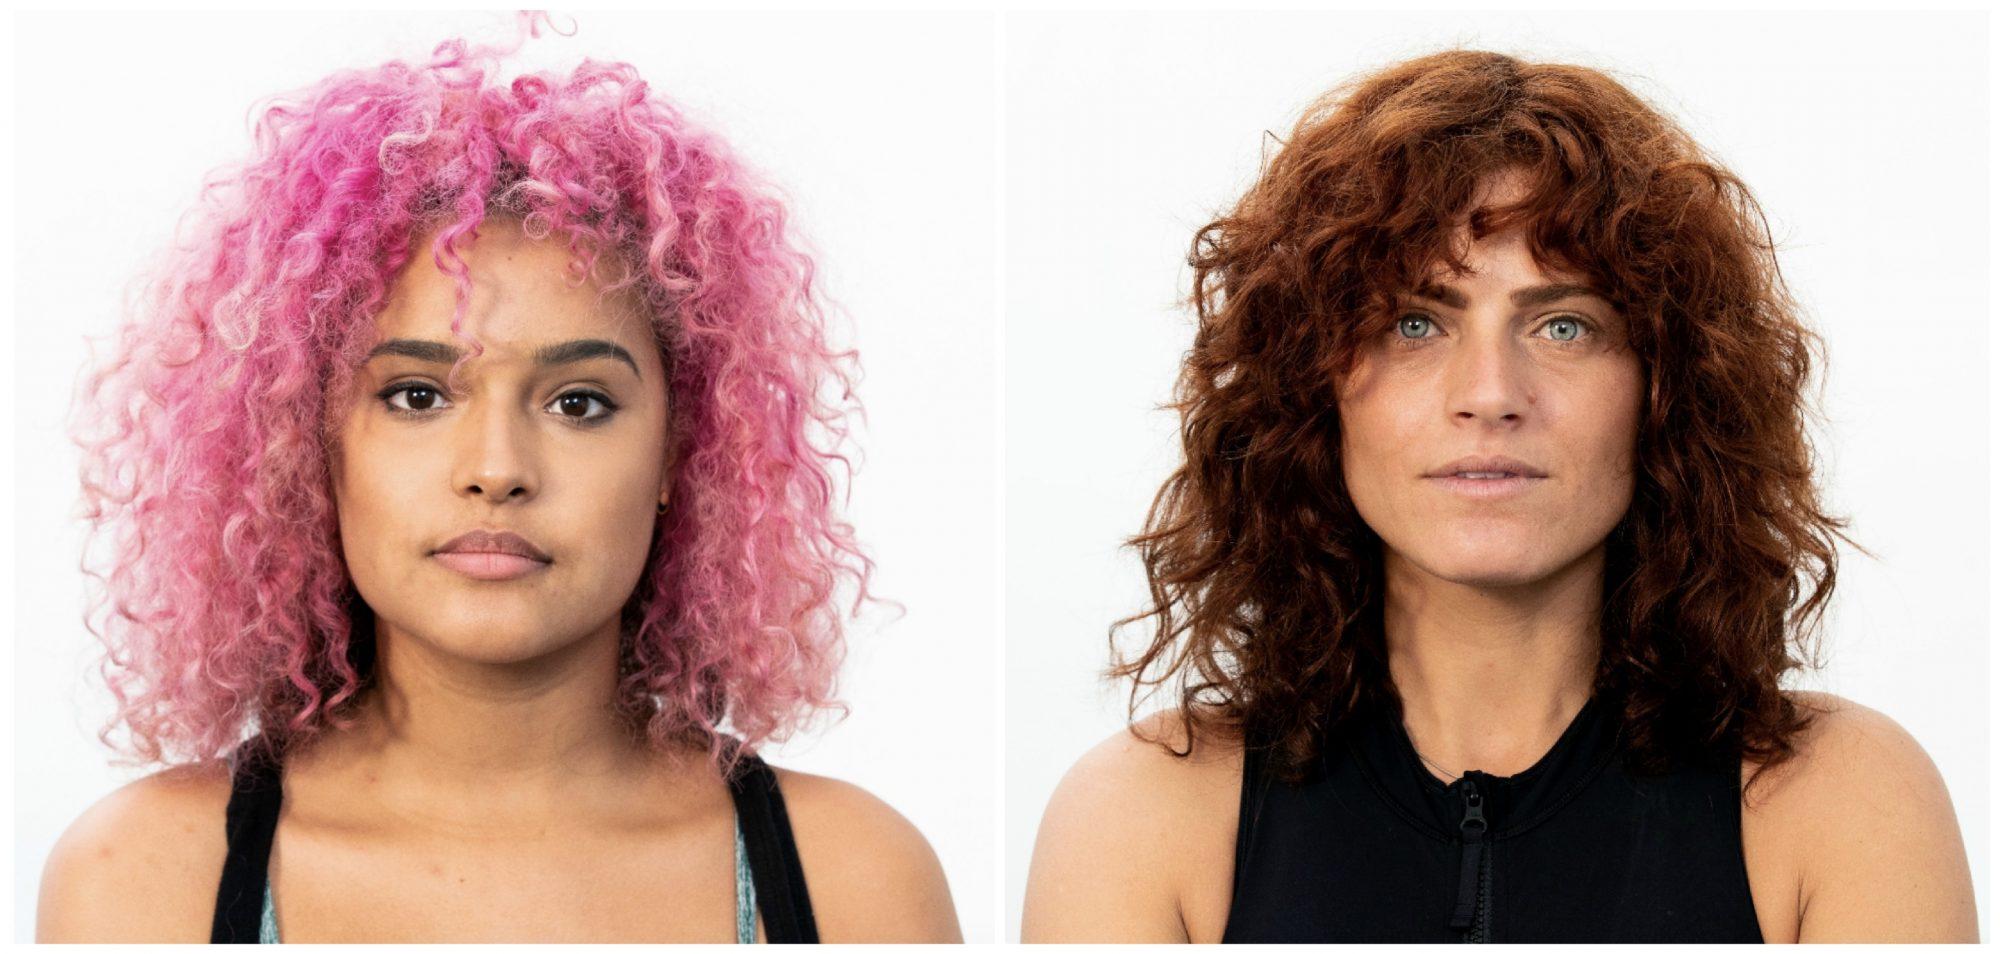 transformation photos